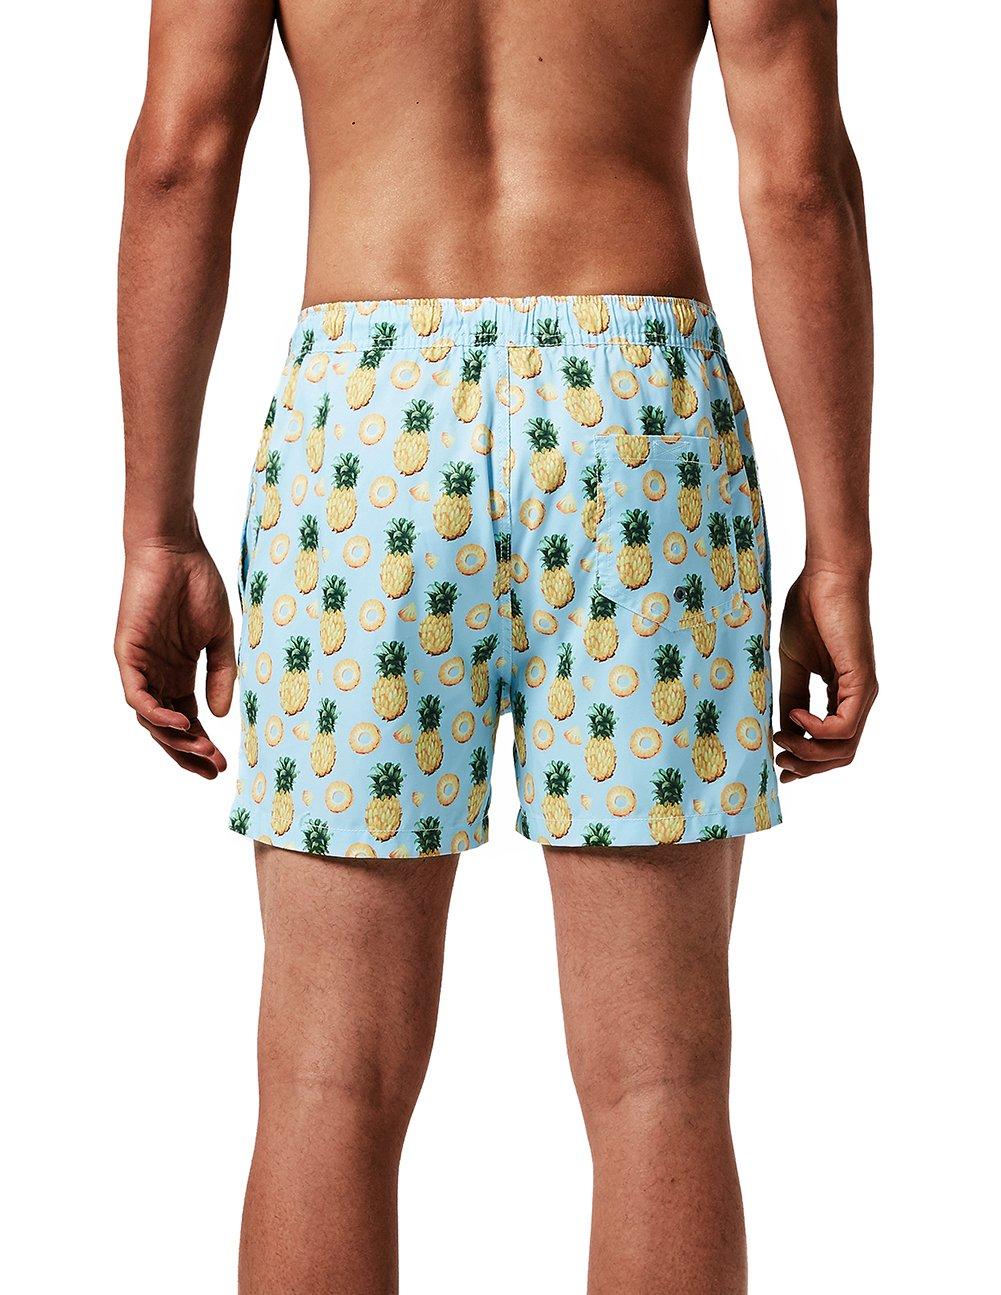 MaaMgic Uomo Costume da Bagno Nuoto Calzoncini Asciugatura Veloce per Spiaggia Mare Piscina 14 spesavip